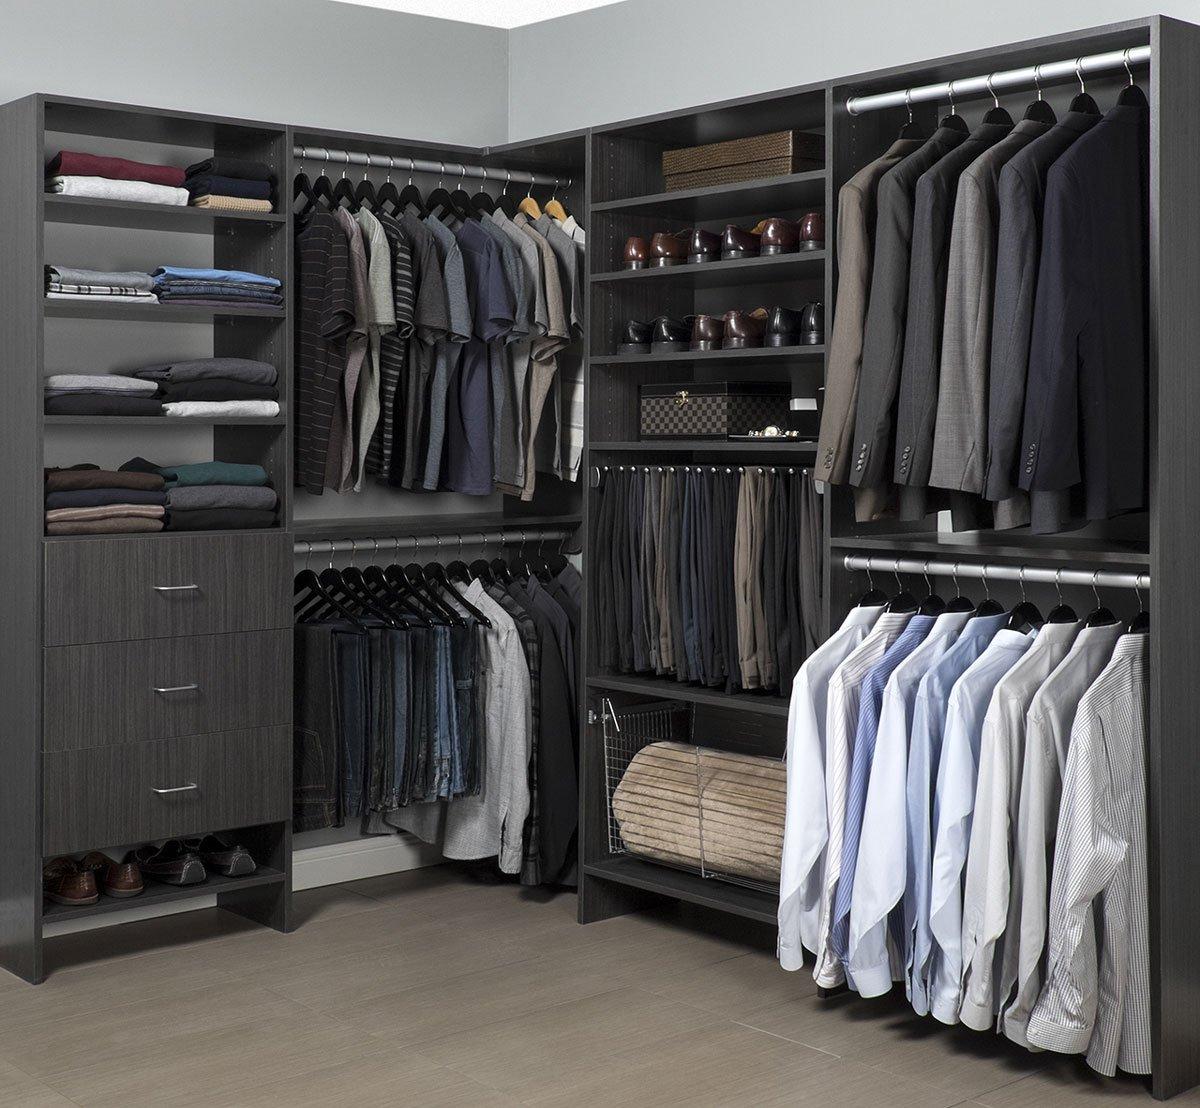 Cabinet systems KTCLNCZ